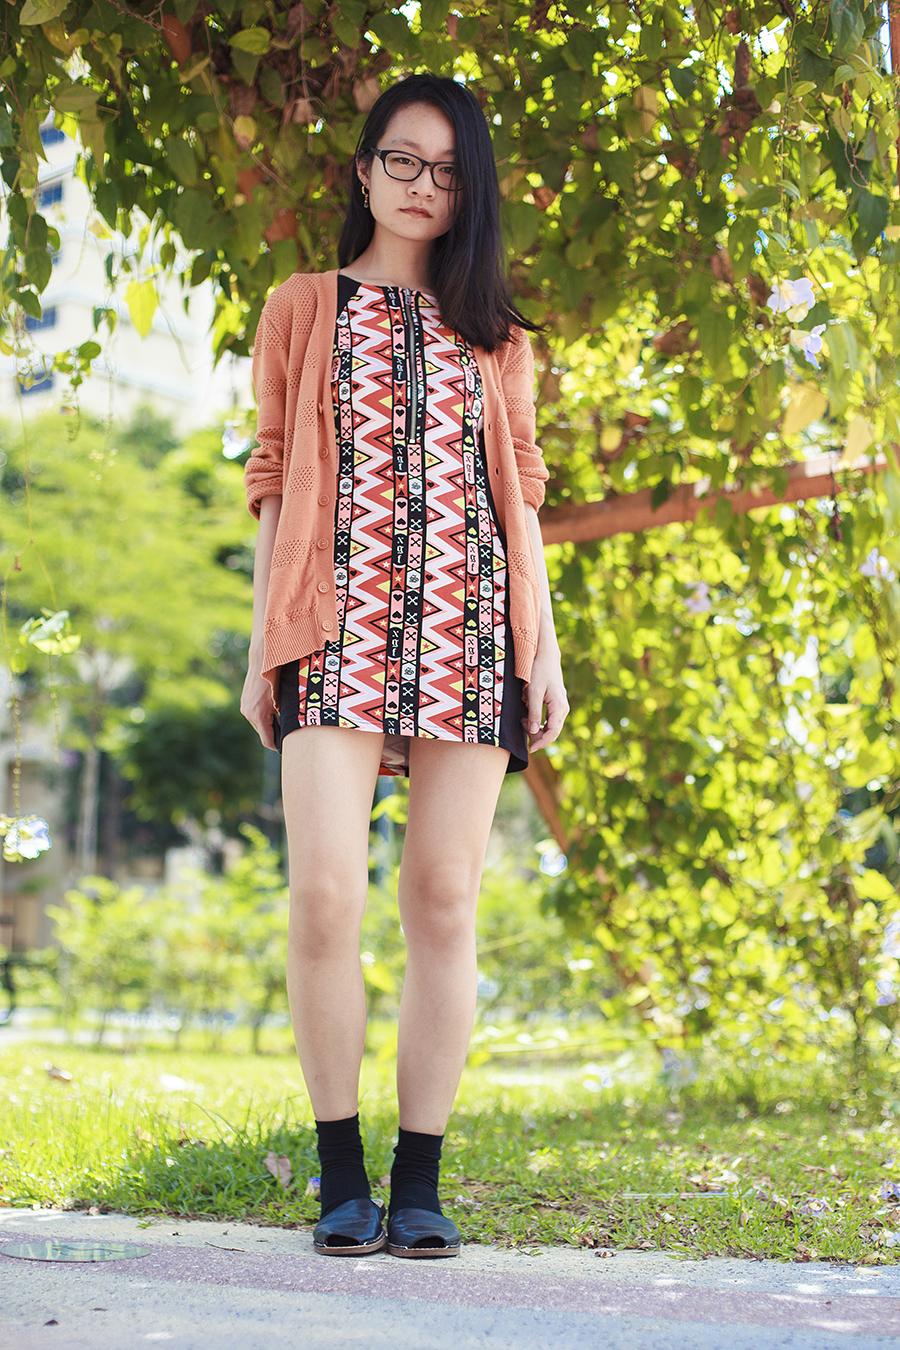 H&M neon zigzag party dress, Forever 21 orange oversized boyfriend cardigan, Gap black frame glasses, gold hoop earrings, Taobao black socks, Sam Edelman slingback sandals c/o Shopbop.